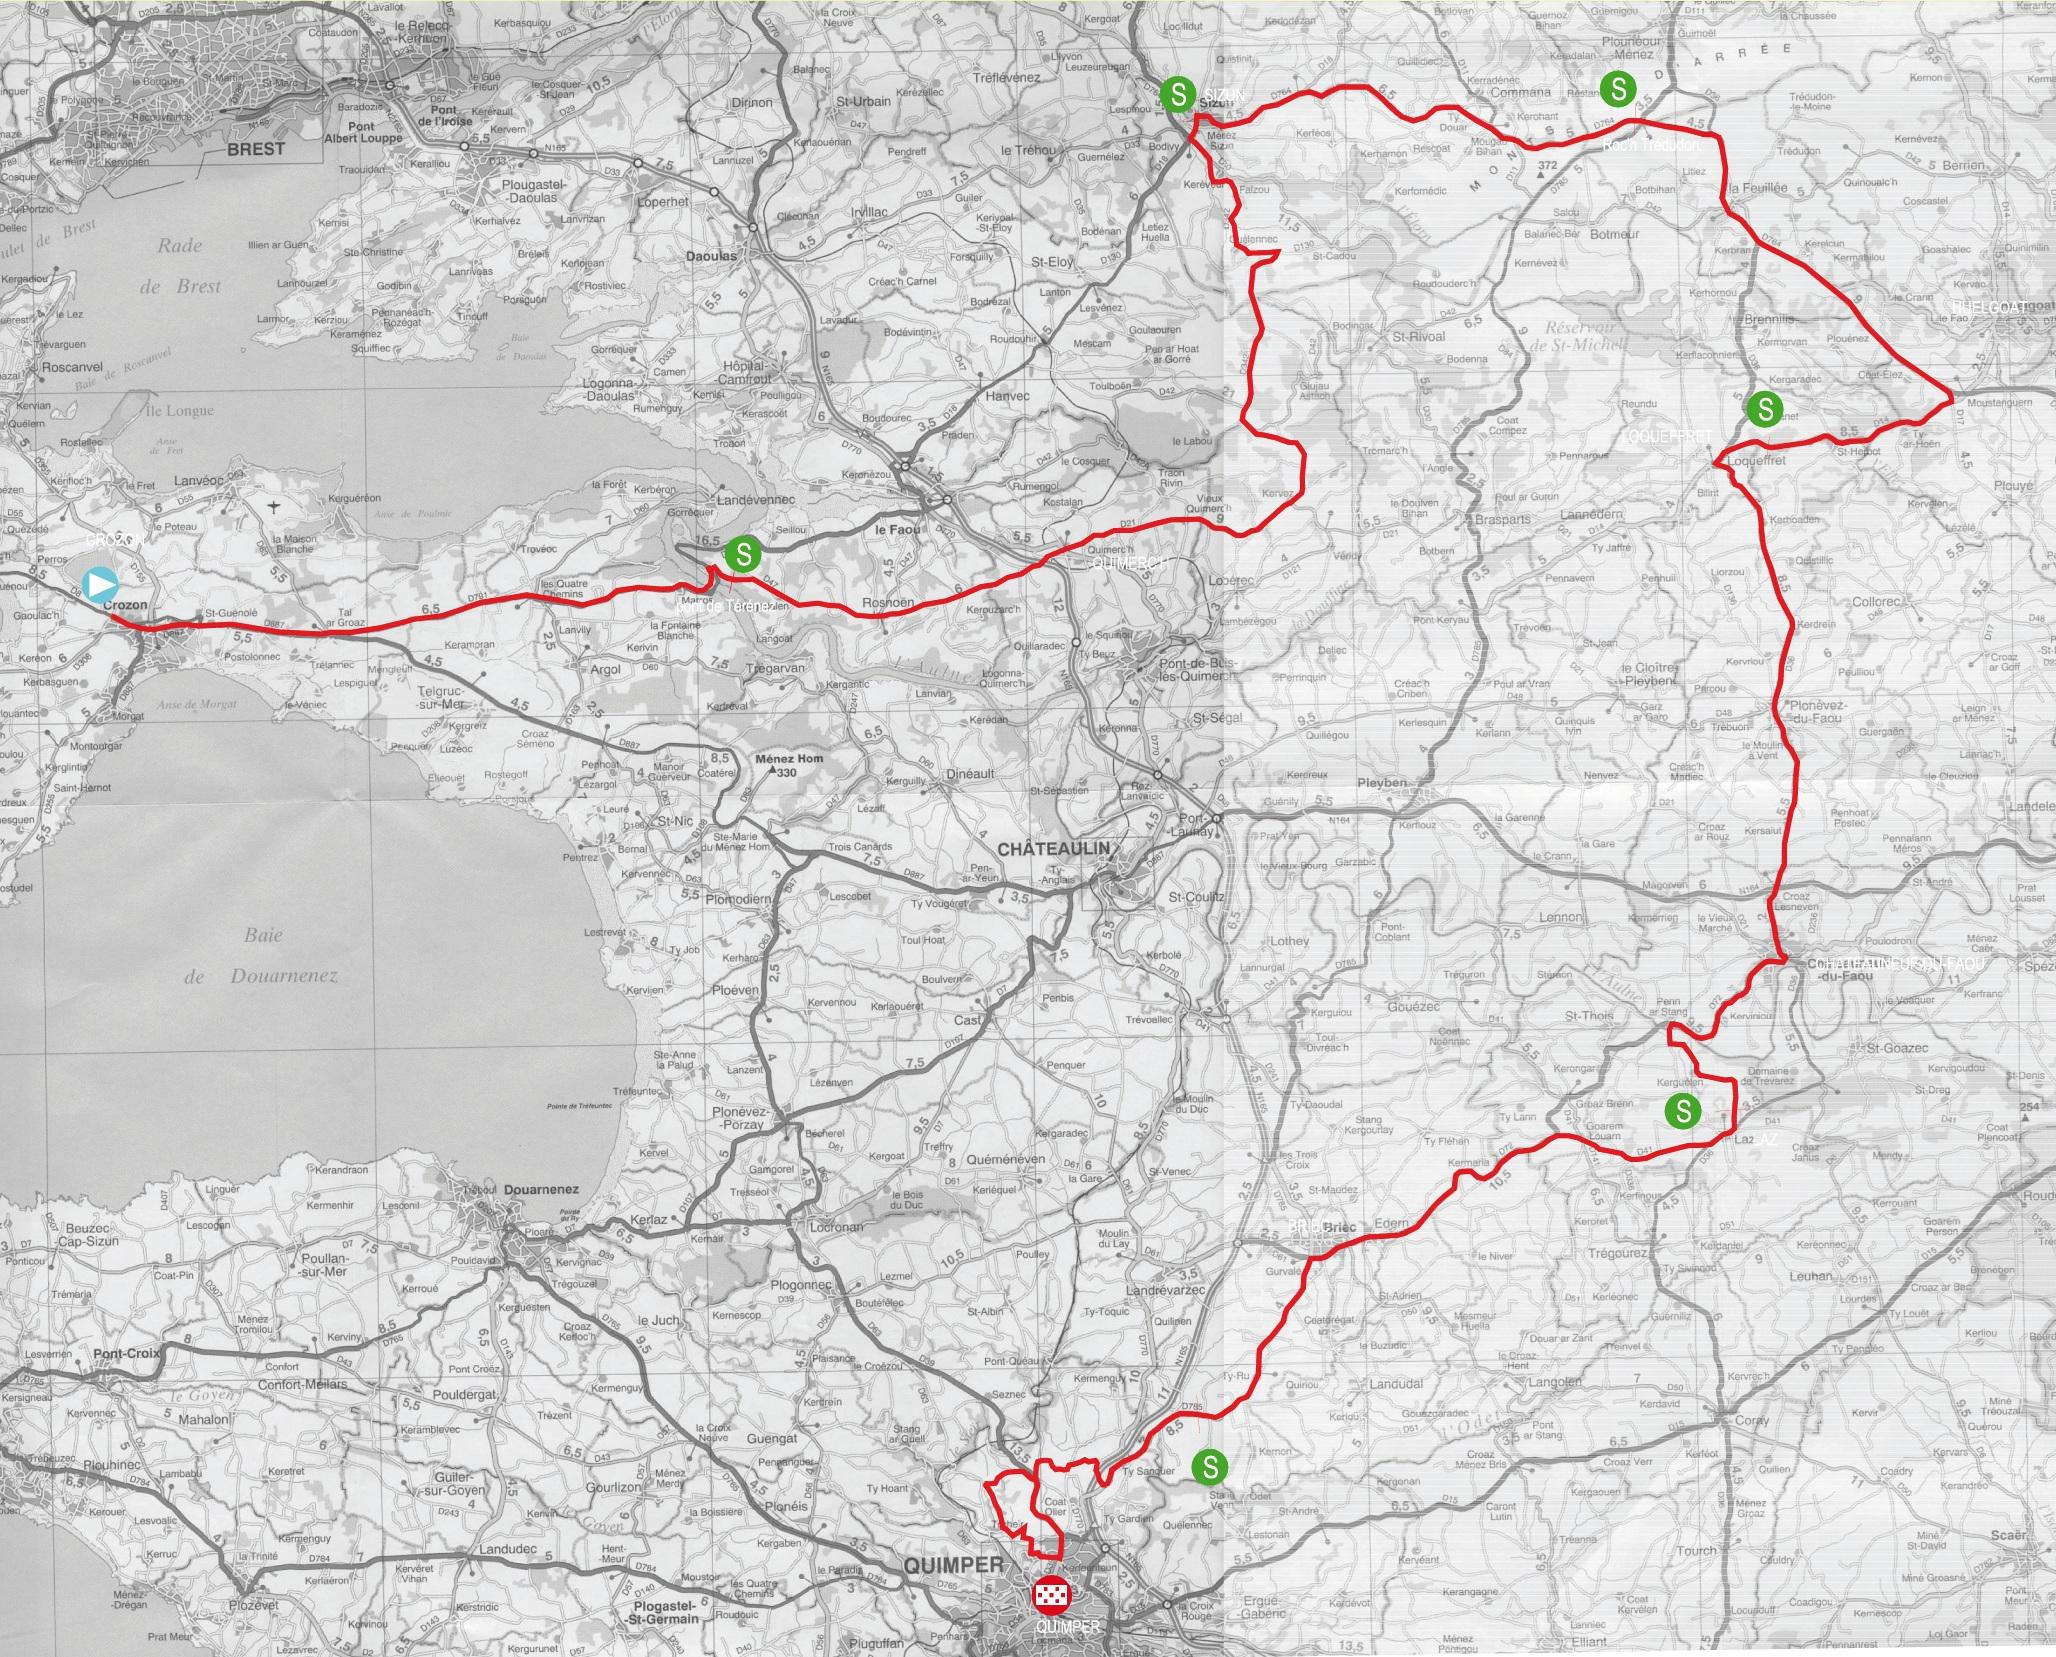 Streckenverlauf Tour du Finistère 2011